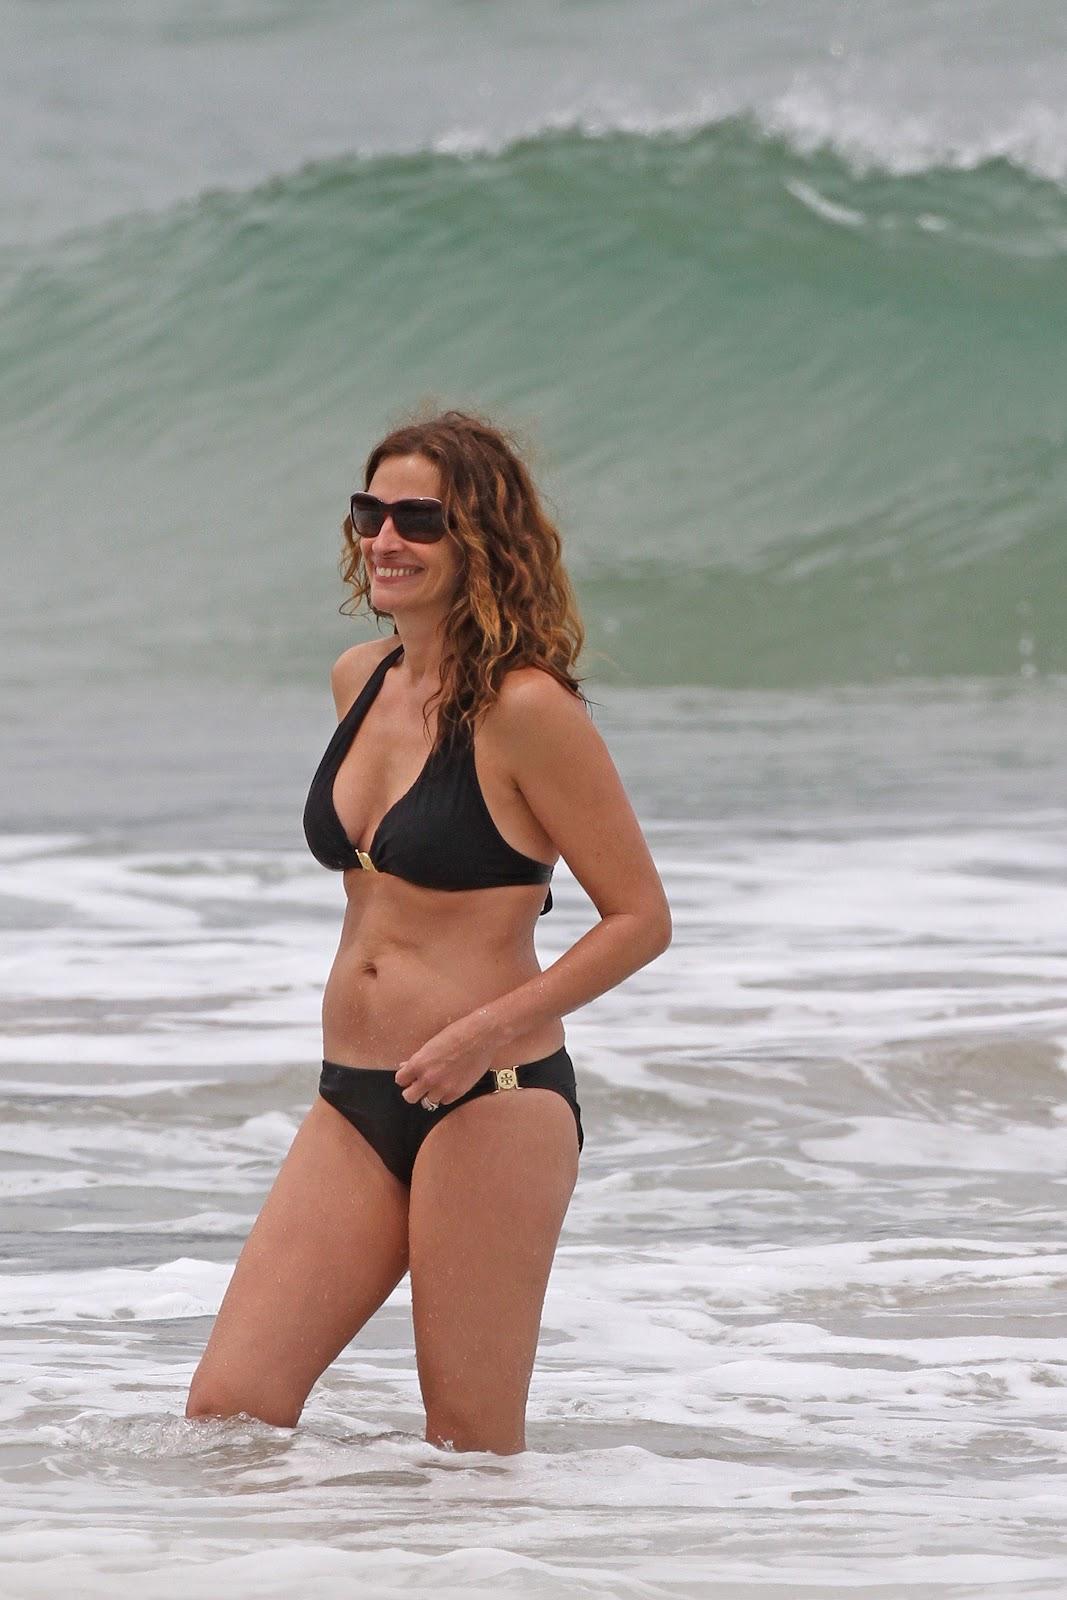 http://3.bp.blogspot.com/-2trPlZgU8RI/T8DssgzekgI/AAAAAAAAHII/QXzIf3GHebc/s1600/+Julia+Roberts+-+Bikini+candids+Hawaii+%252811%2529.jpg